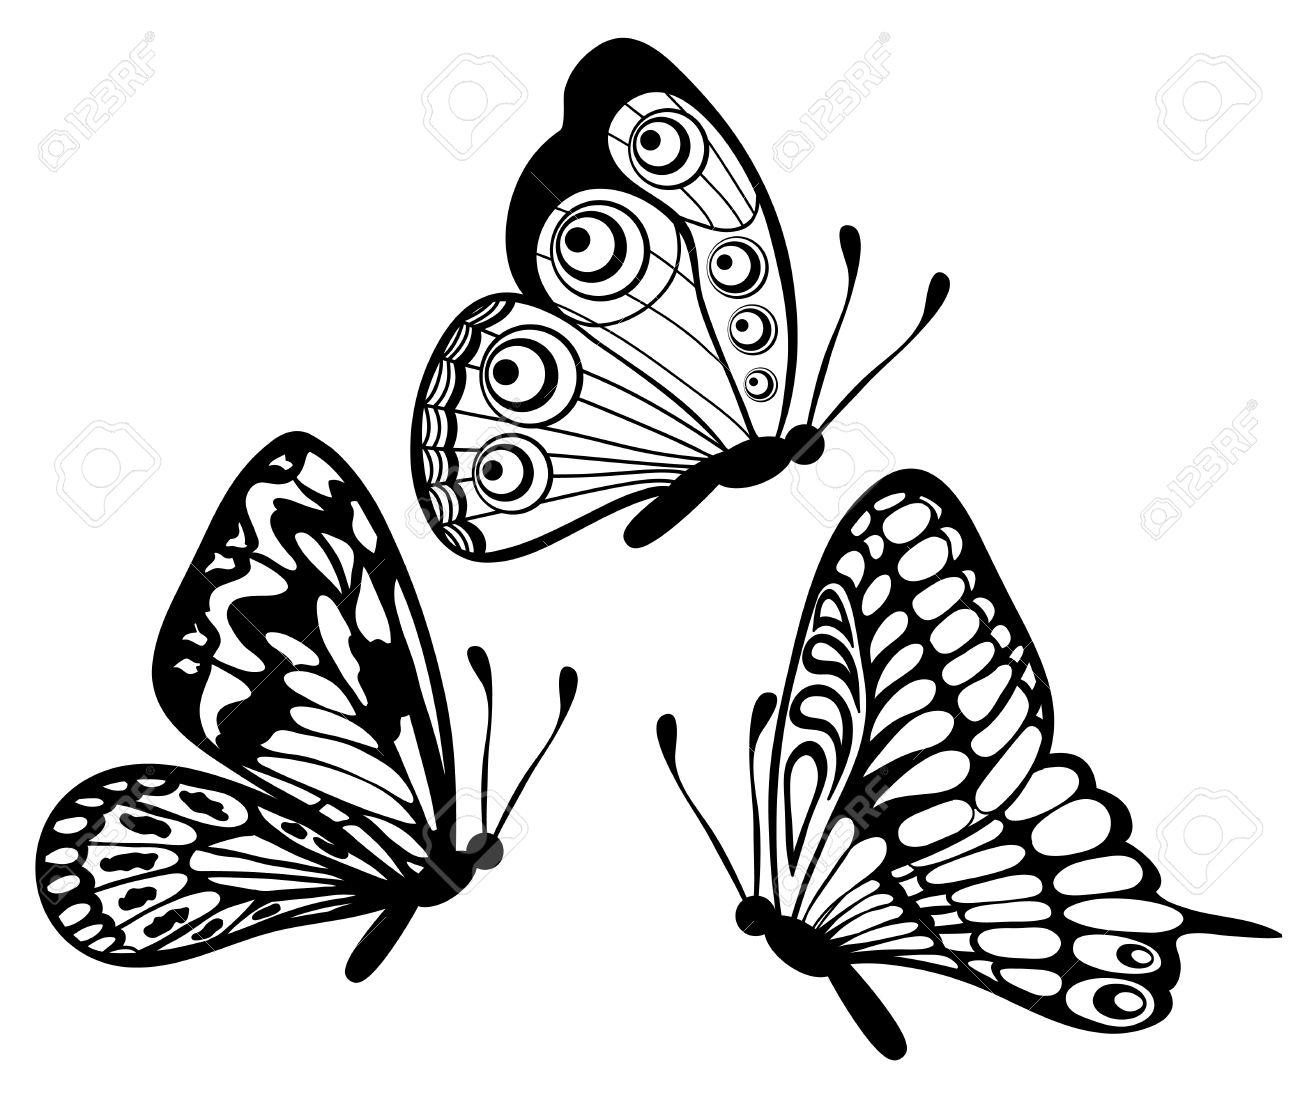 Butterflies Flying Drawing At Getdrawings